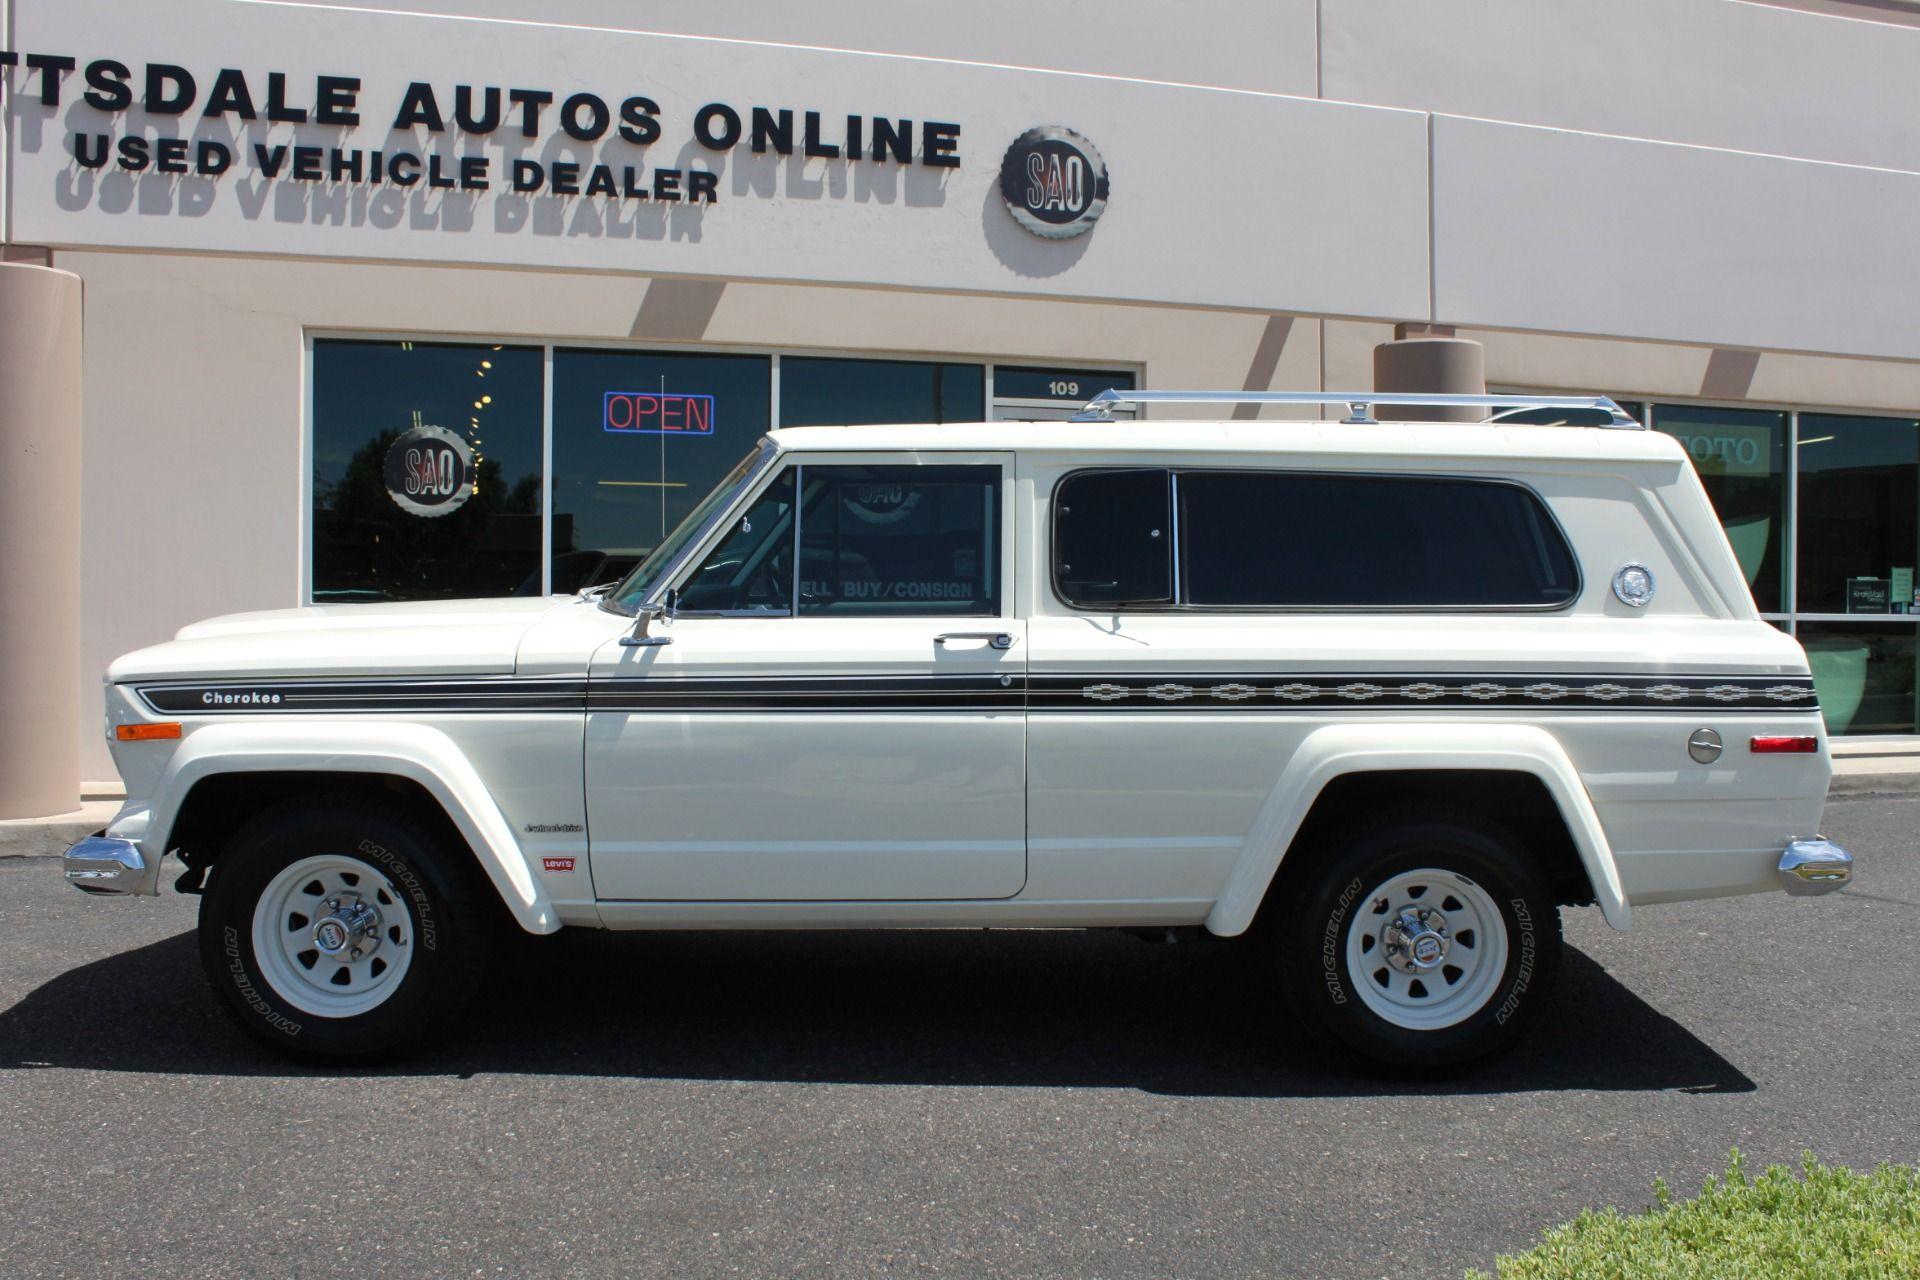 1977 Jeep Cherokee S Widetrack 4x4 401 V8 Stock P1236 For Sale Near Scottsdale Az Az Jeep Dealer With Images Jeep Cherokee Jeep Dealer Jeep